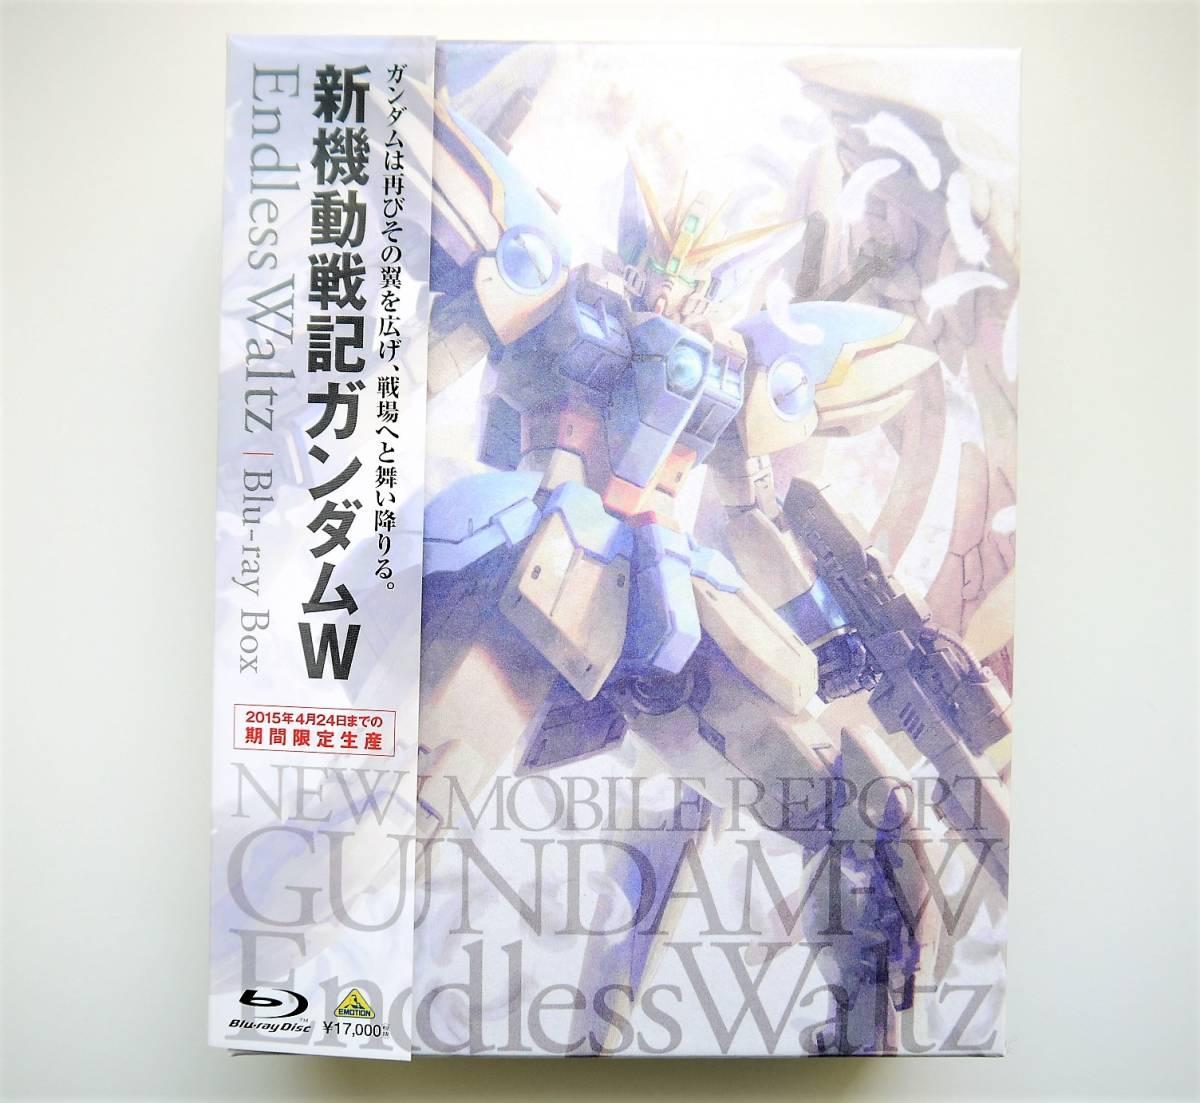 Blu-ray BOX/新機動戦記ガンダムW Endless Waltz/期間限定生産版/緑川光/関俊彦/子安武人/a56